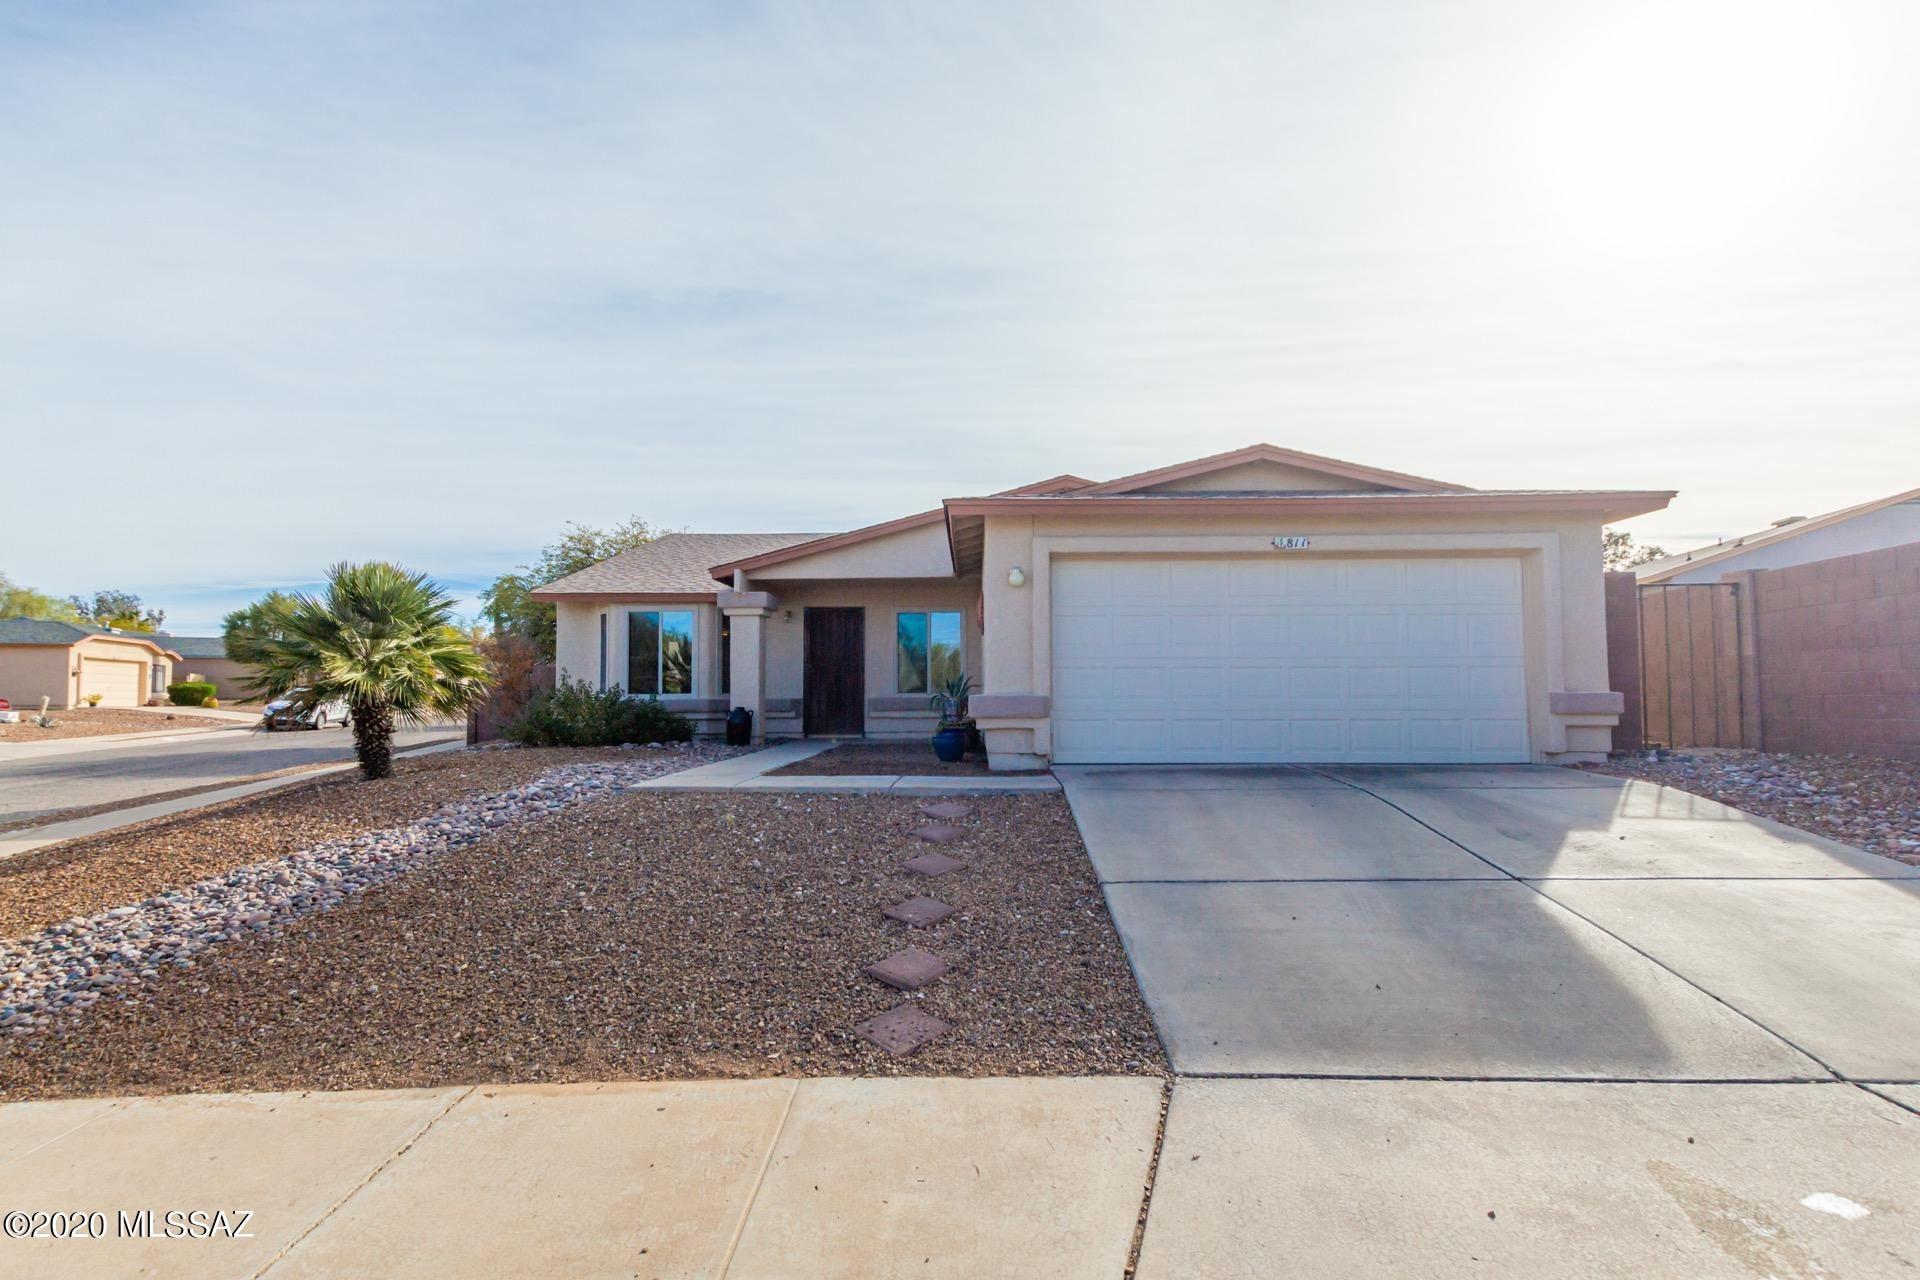 811 S Chimney Canyon Drive, Tucson, AZ 85748 - MLS#: 22030938